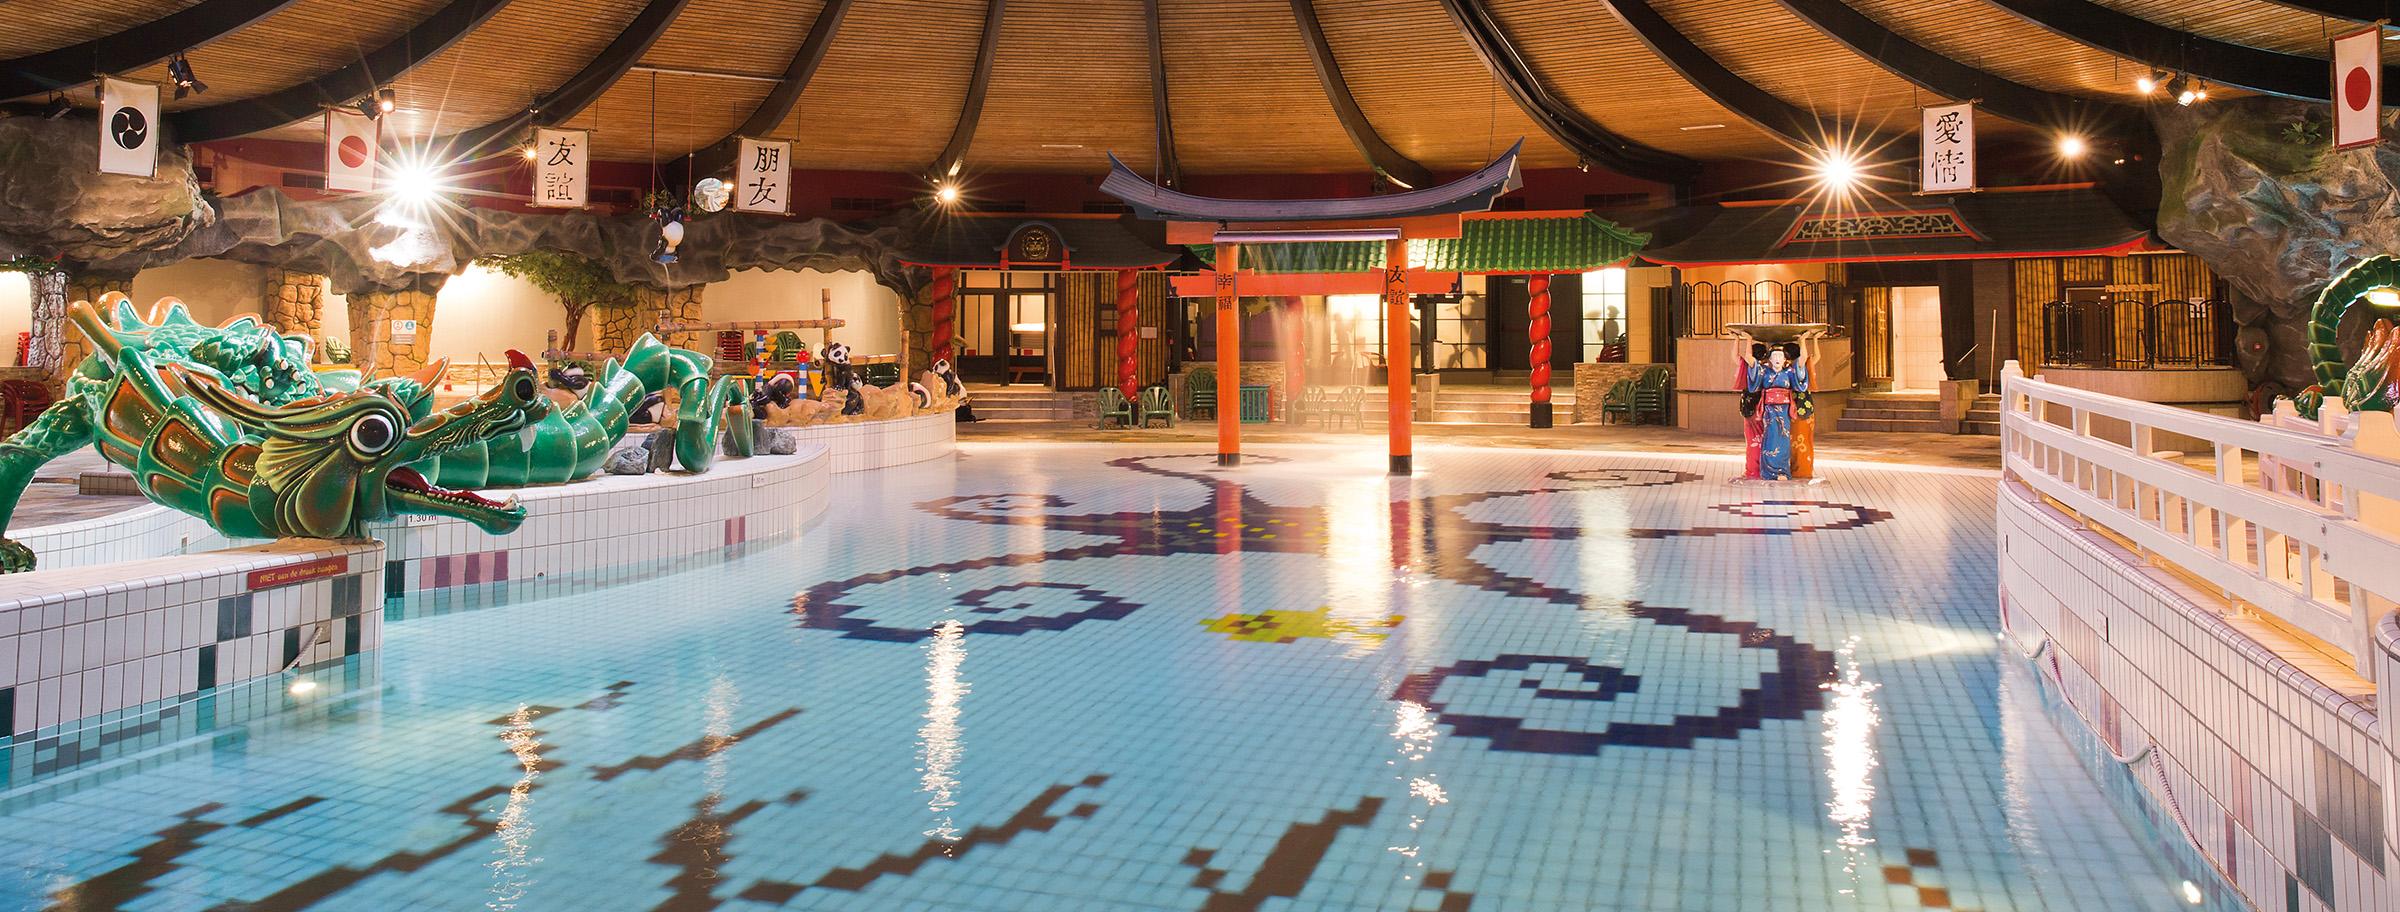 Supertrips - All-inclusive Hotel De Bonte Wever Assen